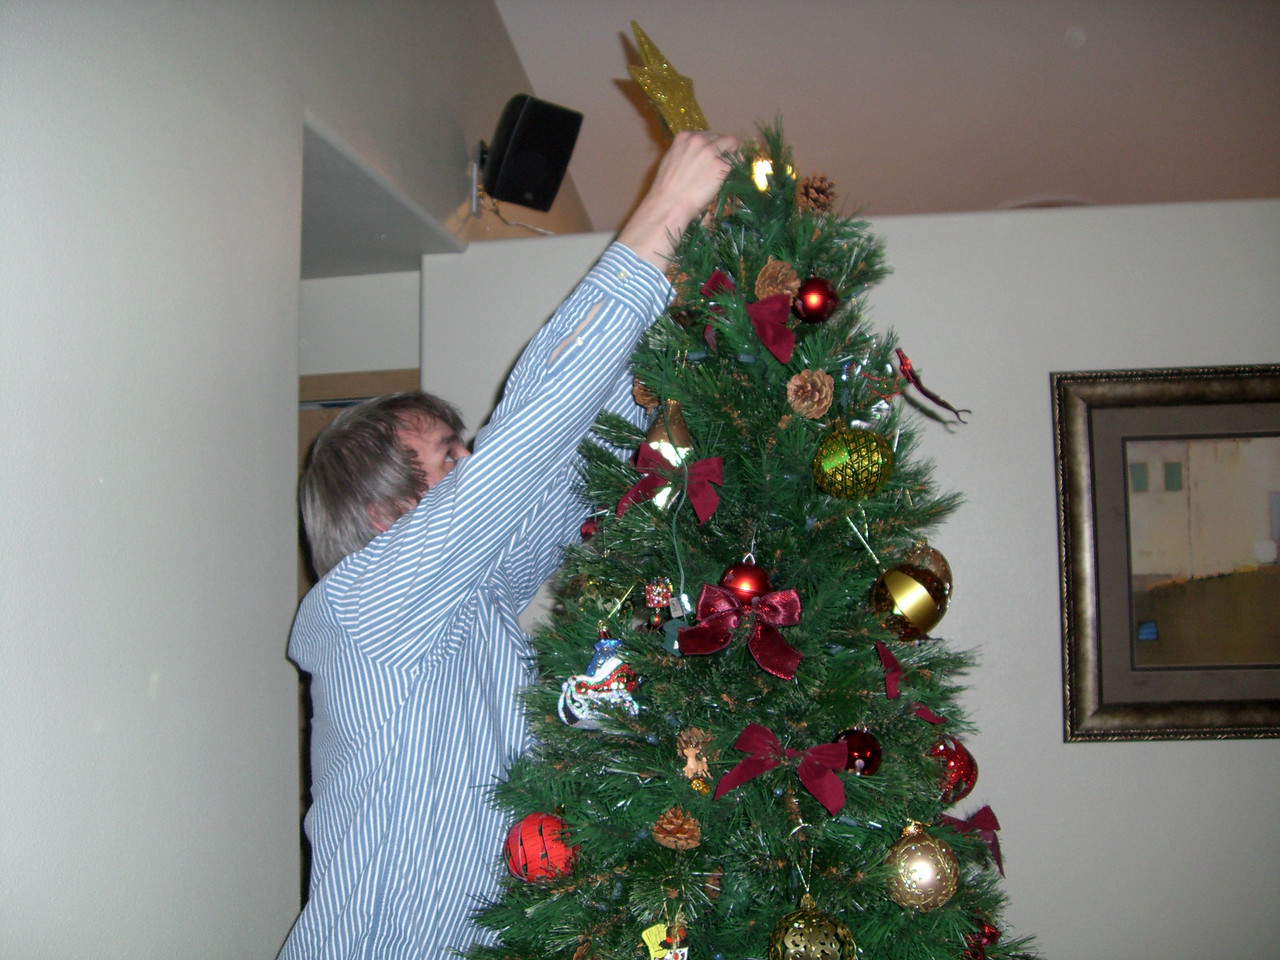 Decorating the Christmas tree (Dec. '08)!